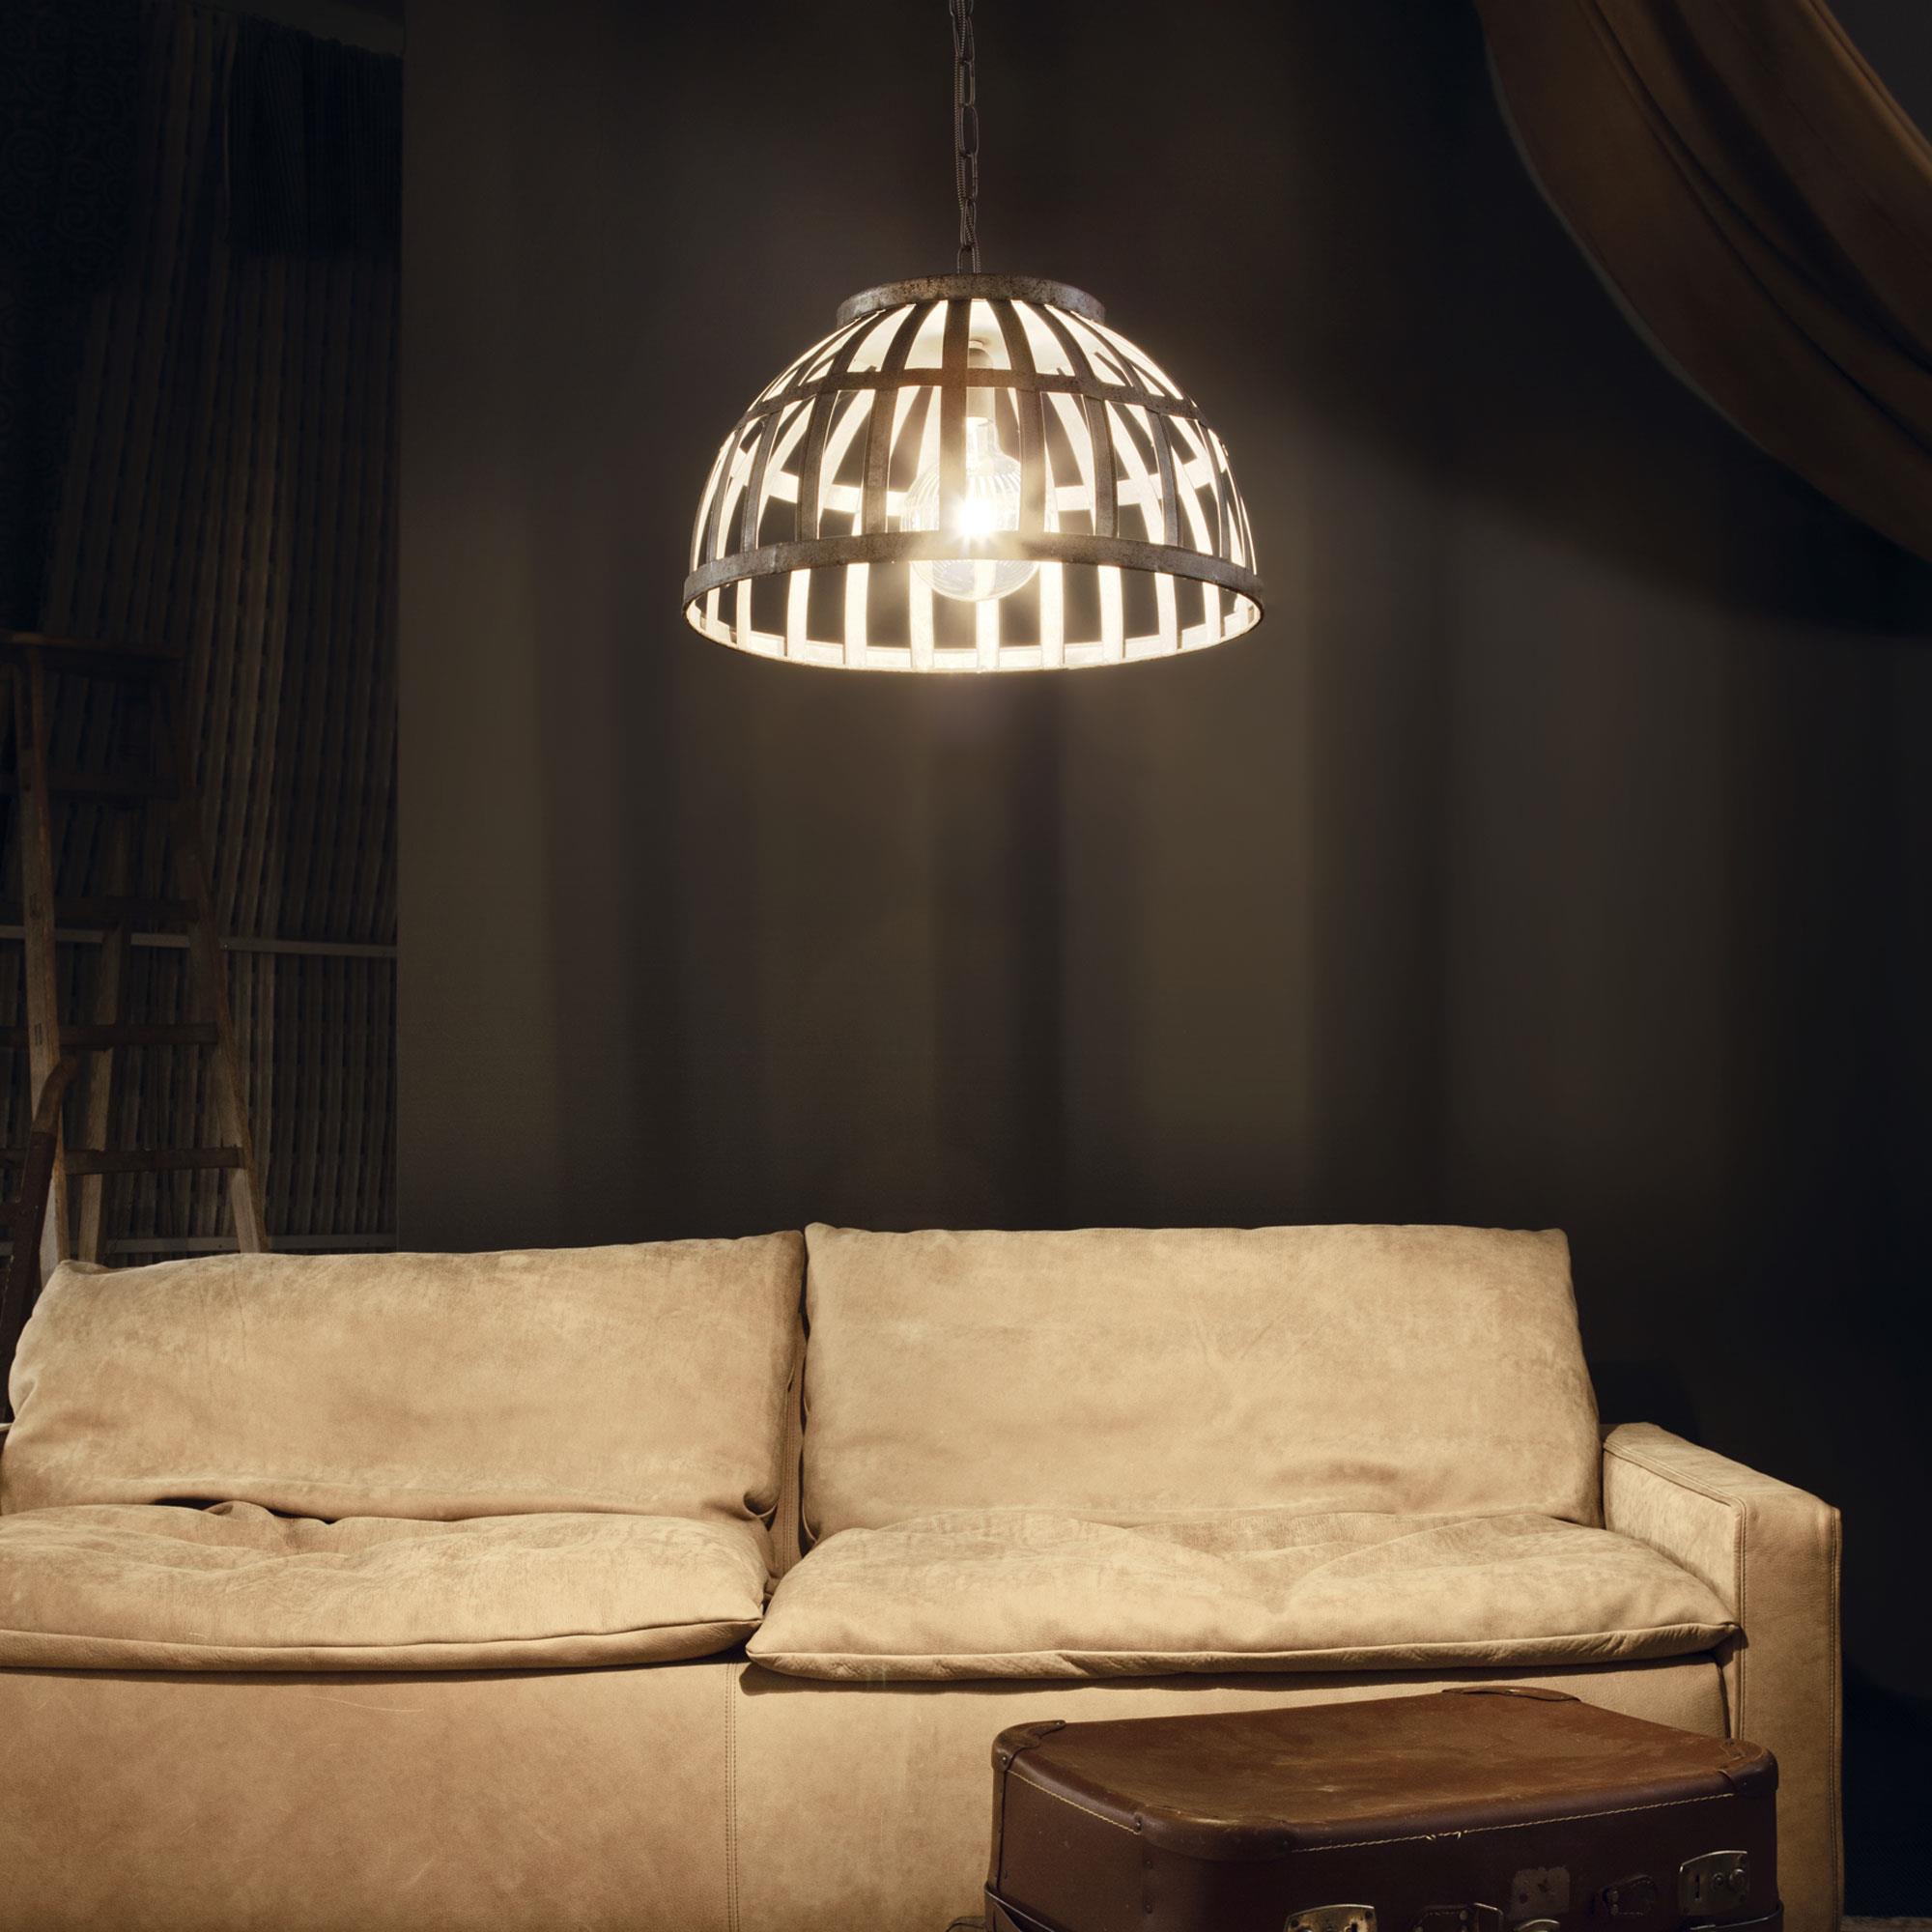 Ideal Lux 162416 CESTO SP1 lámpa függeszték